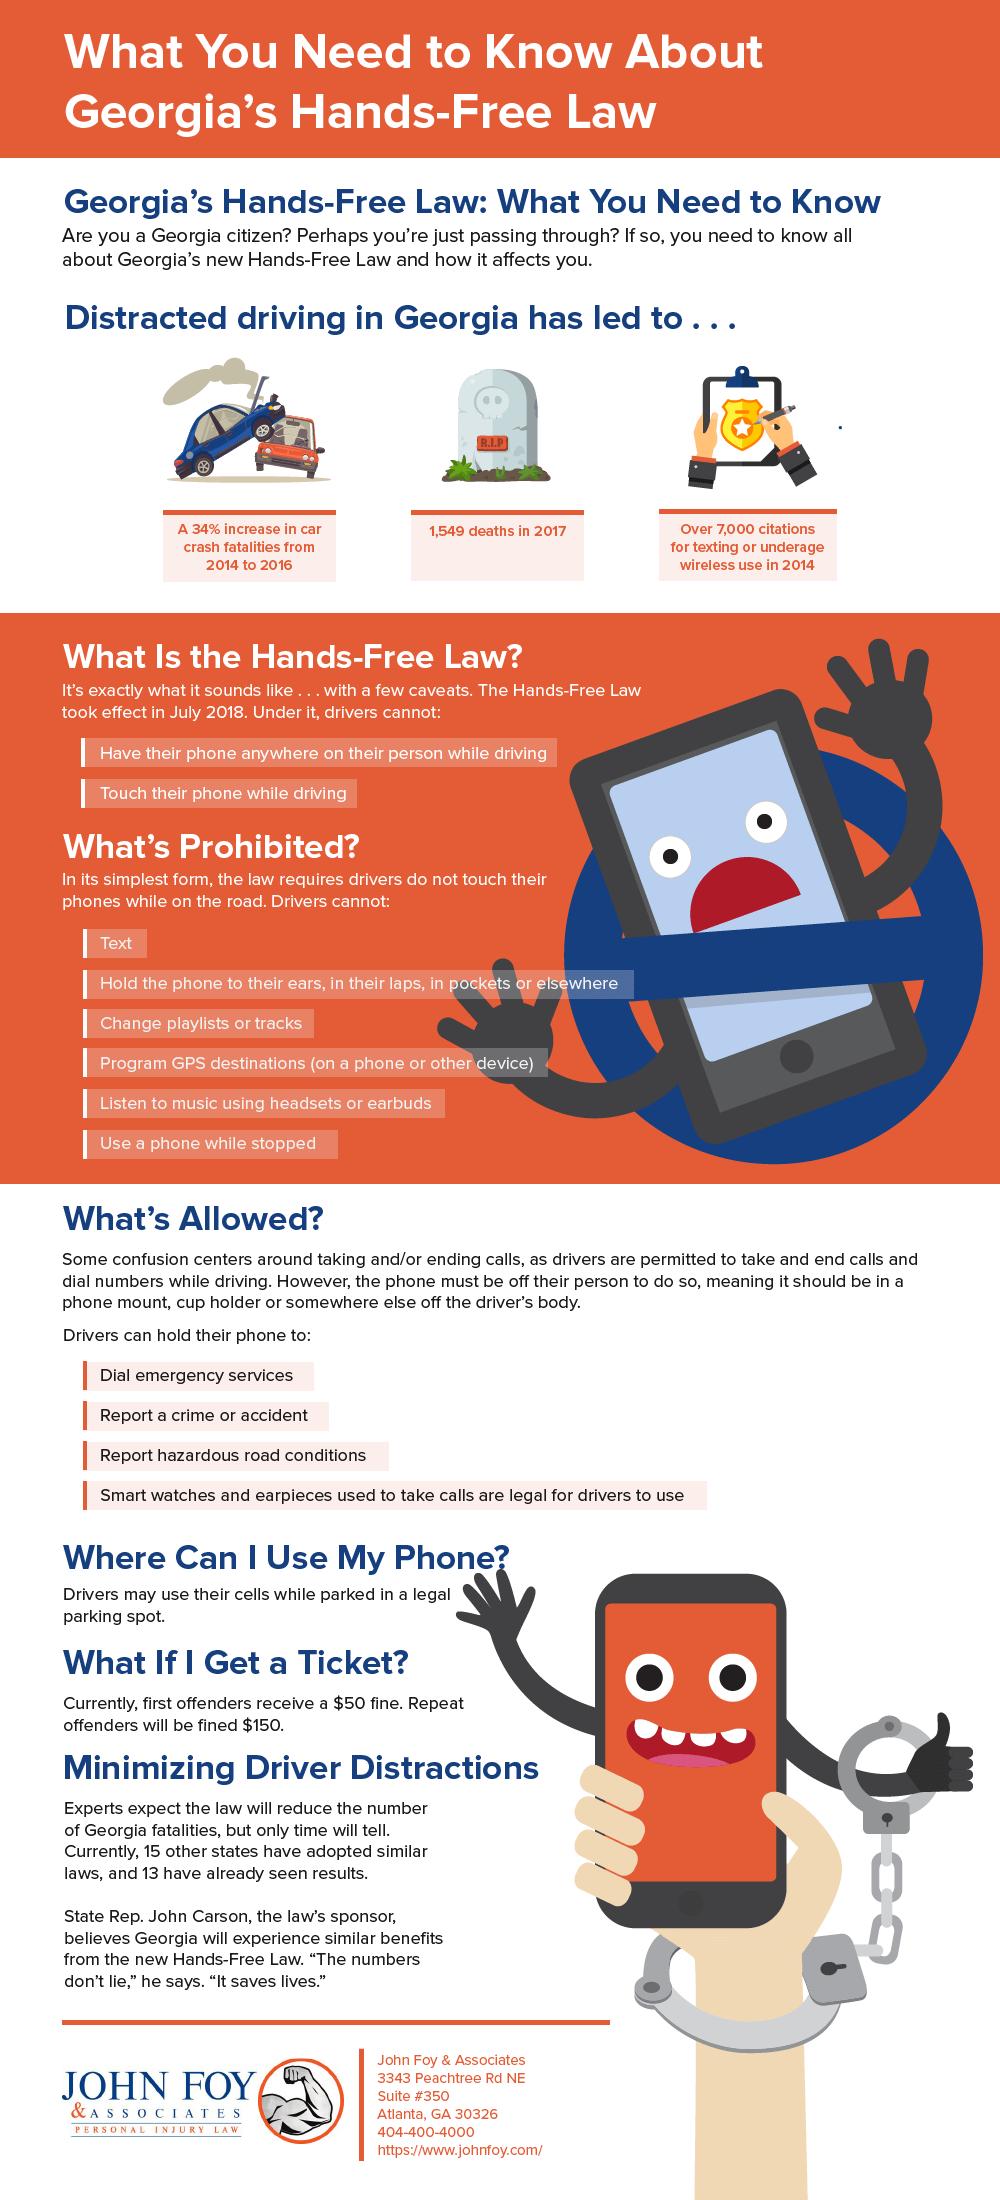 georgia-free-hands-law-infographic-plaza